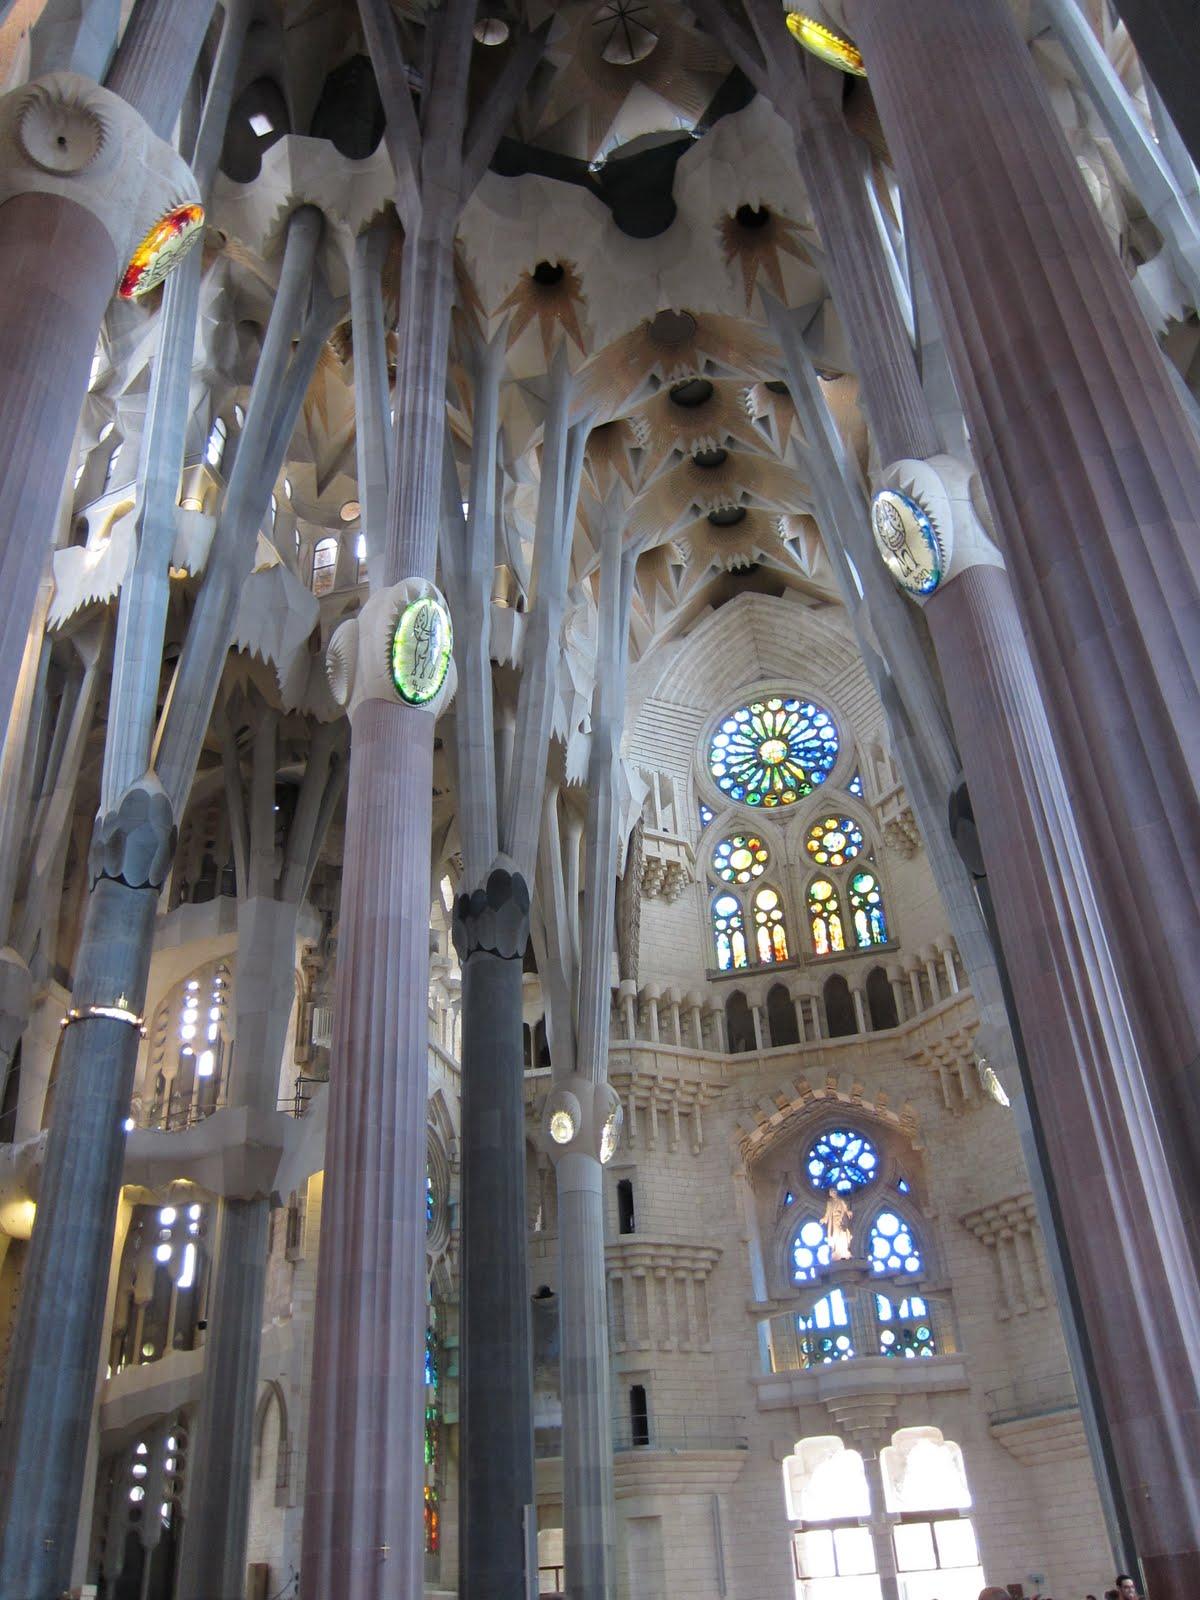 Lisa elsewhere sagrada familia interior - Sagrada familia interieur ...